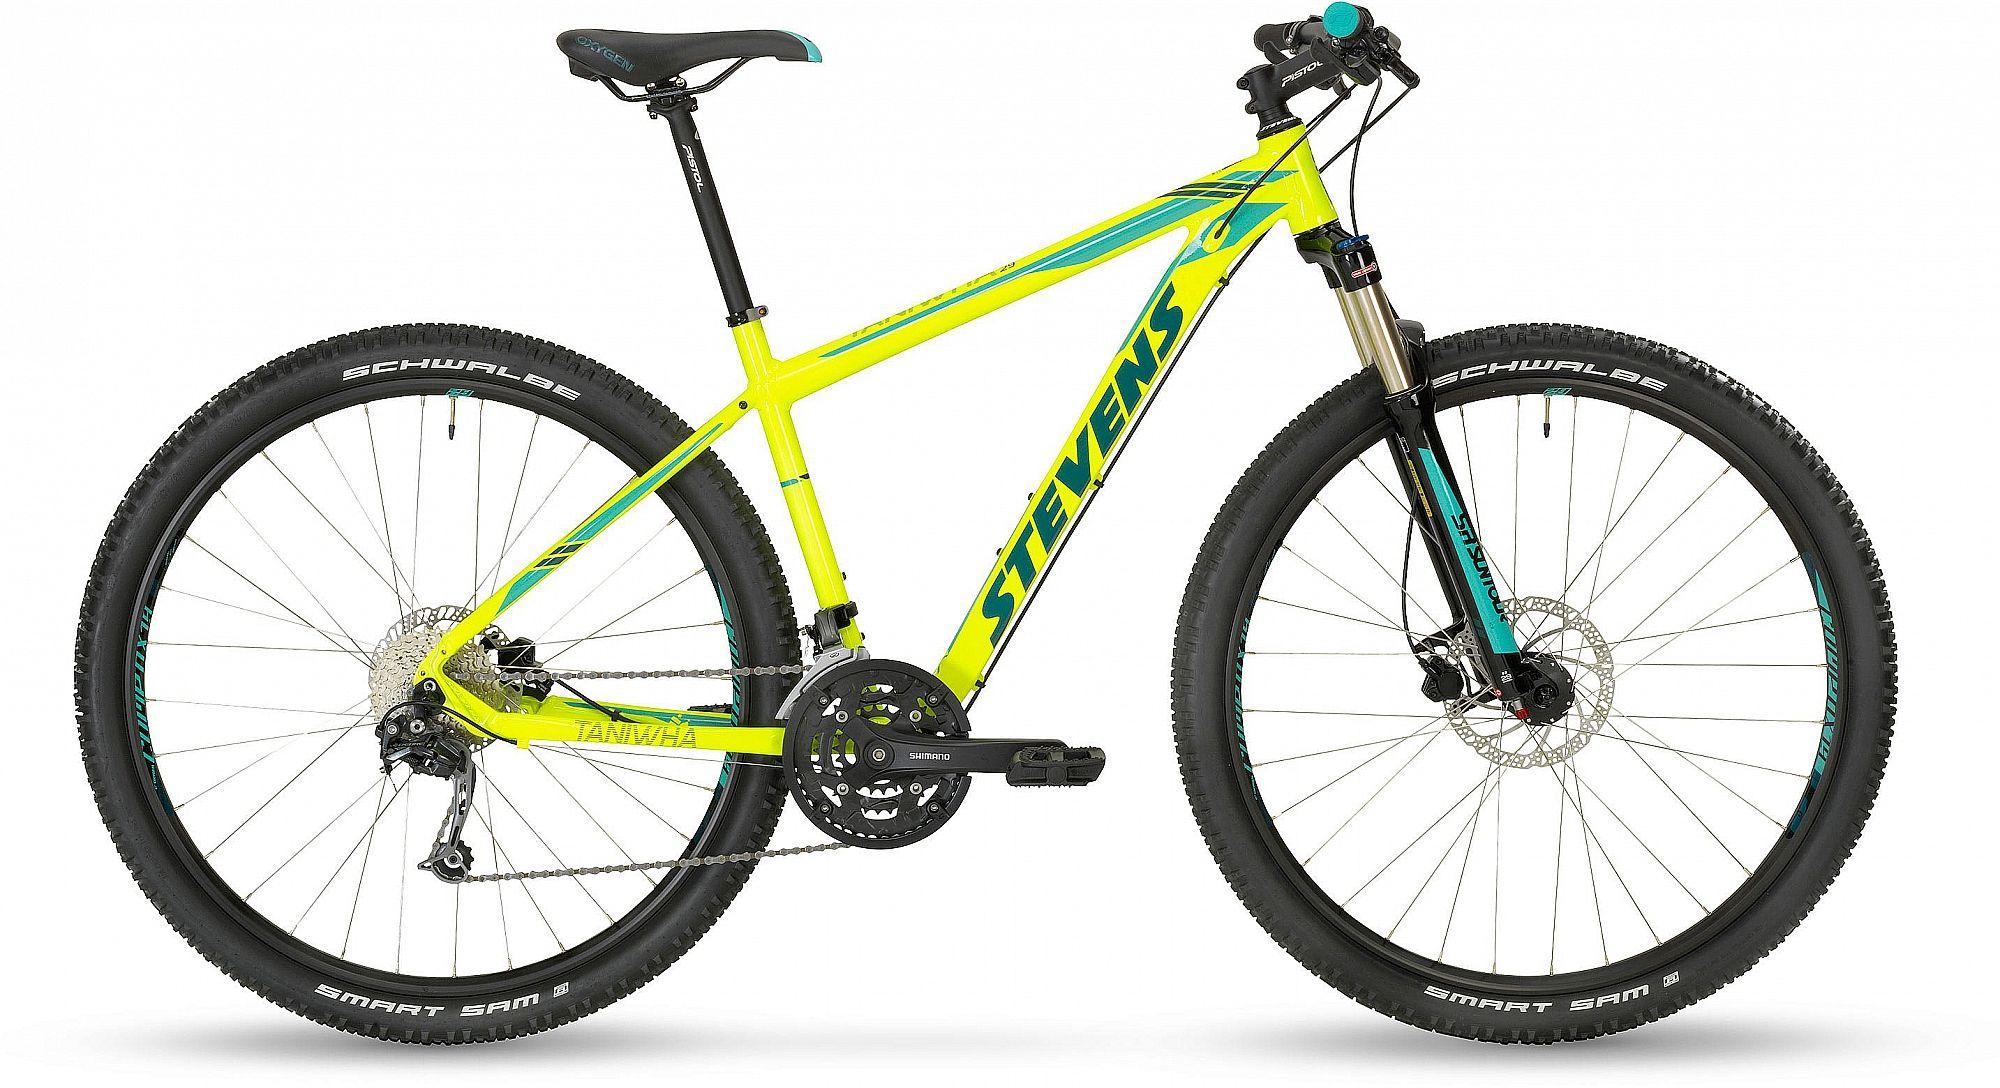 stevens 2017 taniwha 29 lut xc alloy stevens bikes. Black Bedroom Furniture Sets. Home Design Ideas